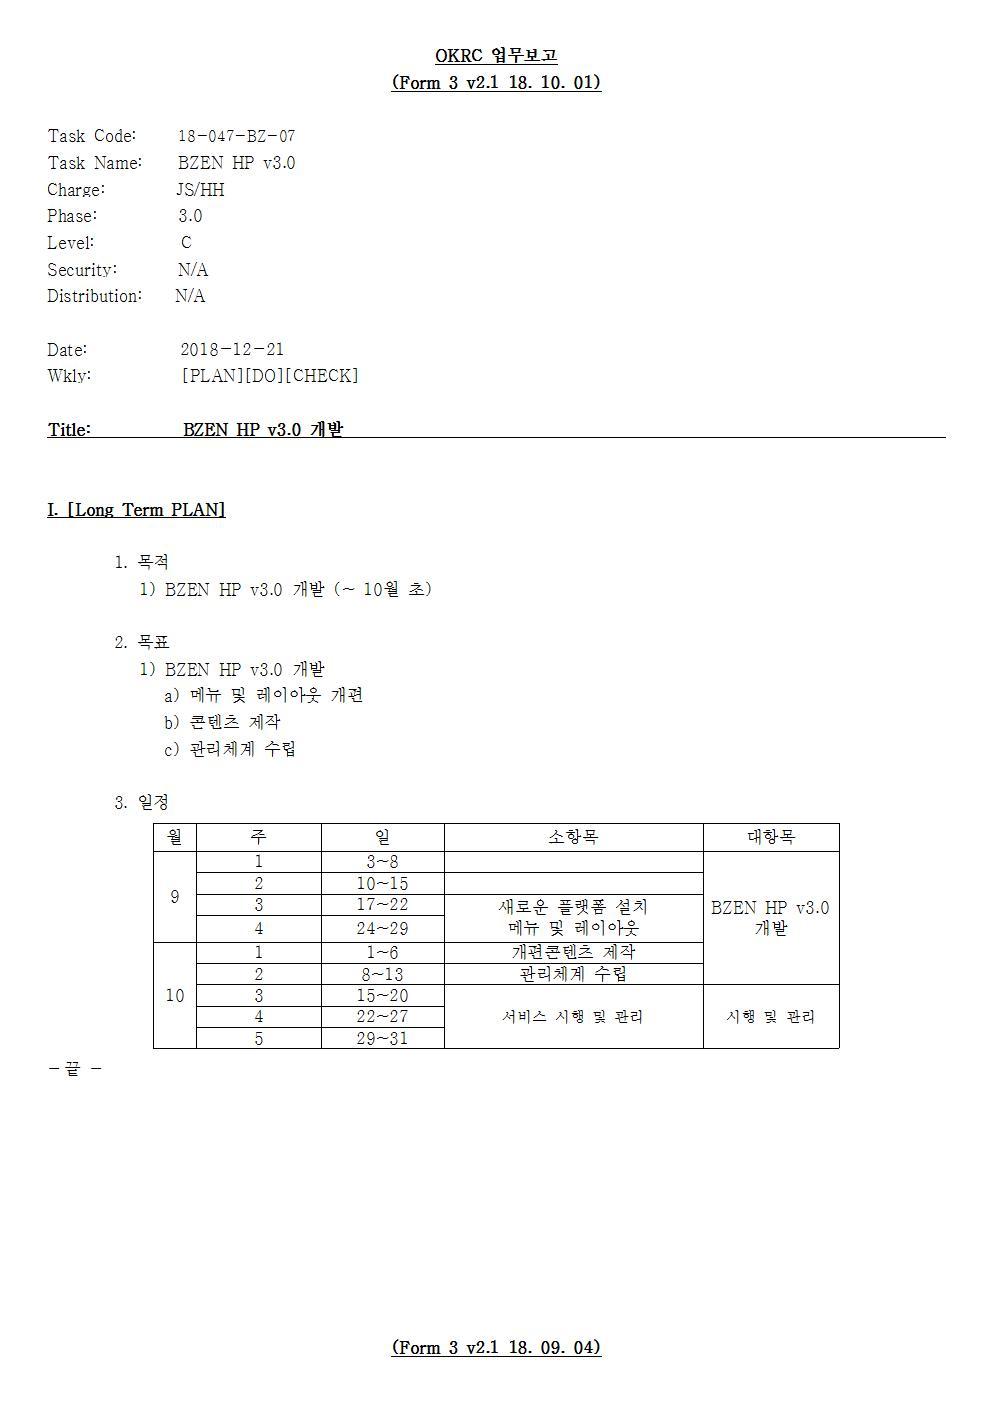 D-[18-047-BZ-07]-[BZEN HP v3.0]-[2018-12-21][HH]001.jpg